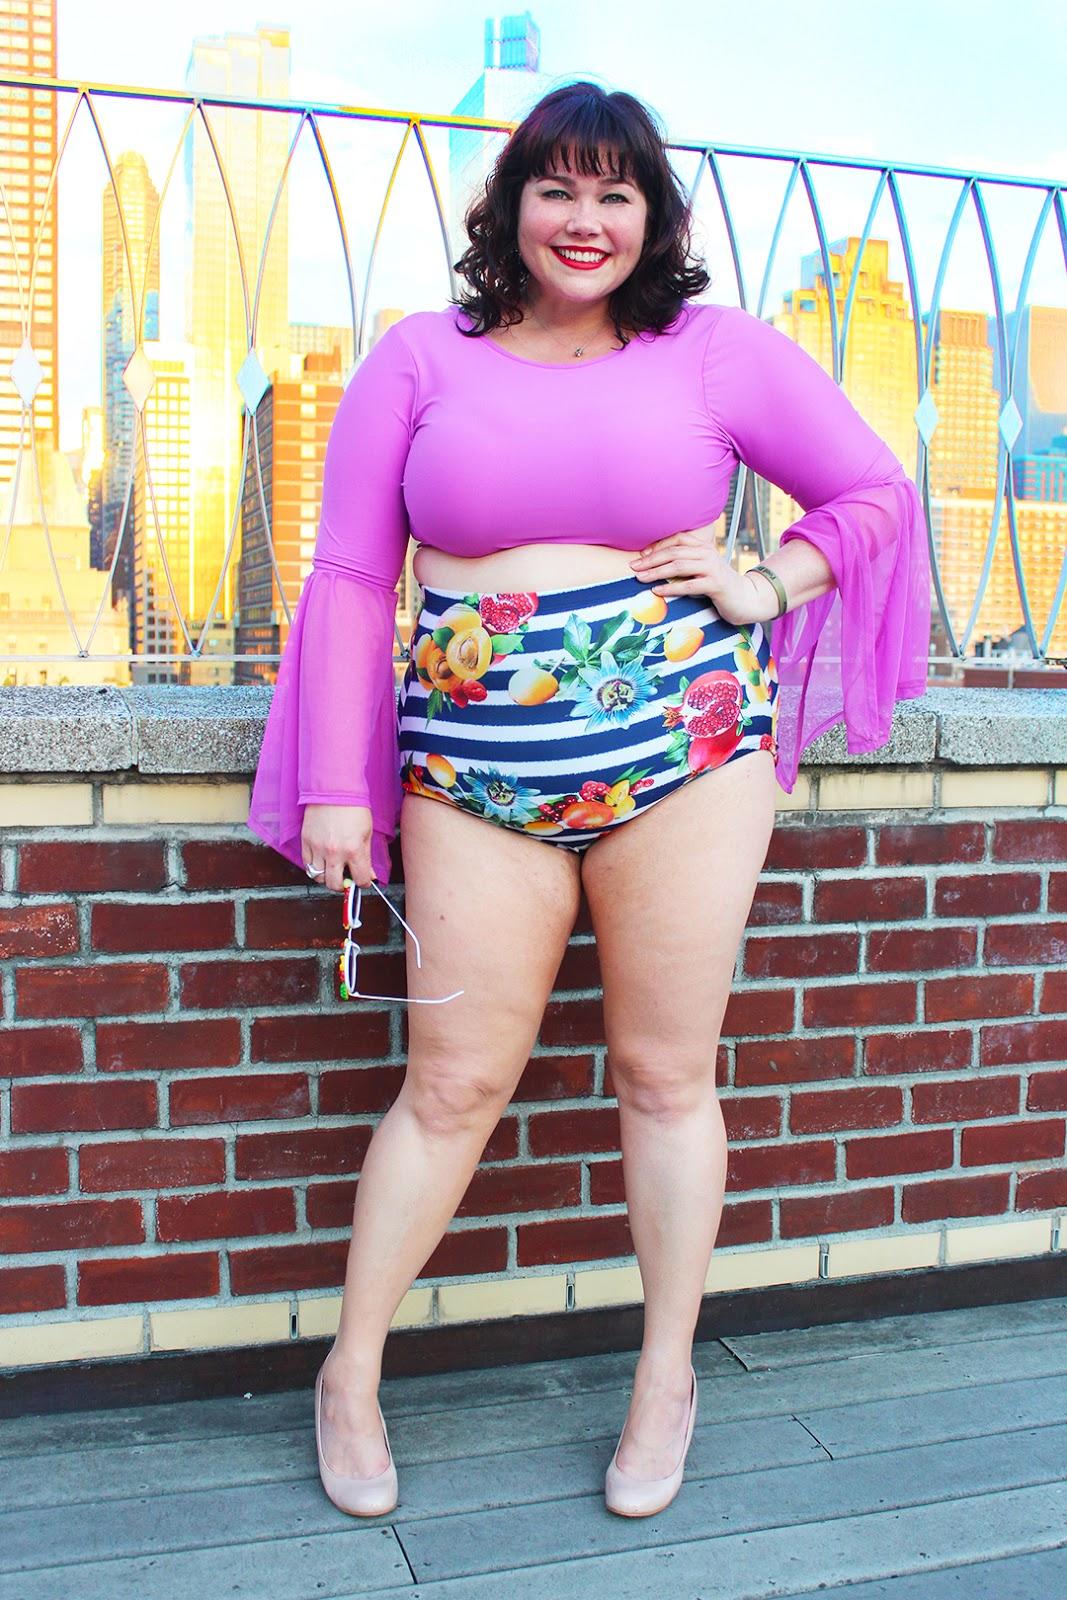 Plus Size Pool Party Archives | Style Plus Curves - A Chicago Plus Size  Fashion Blog